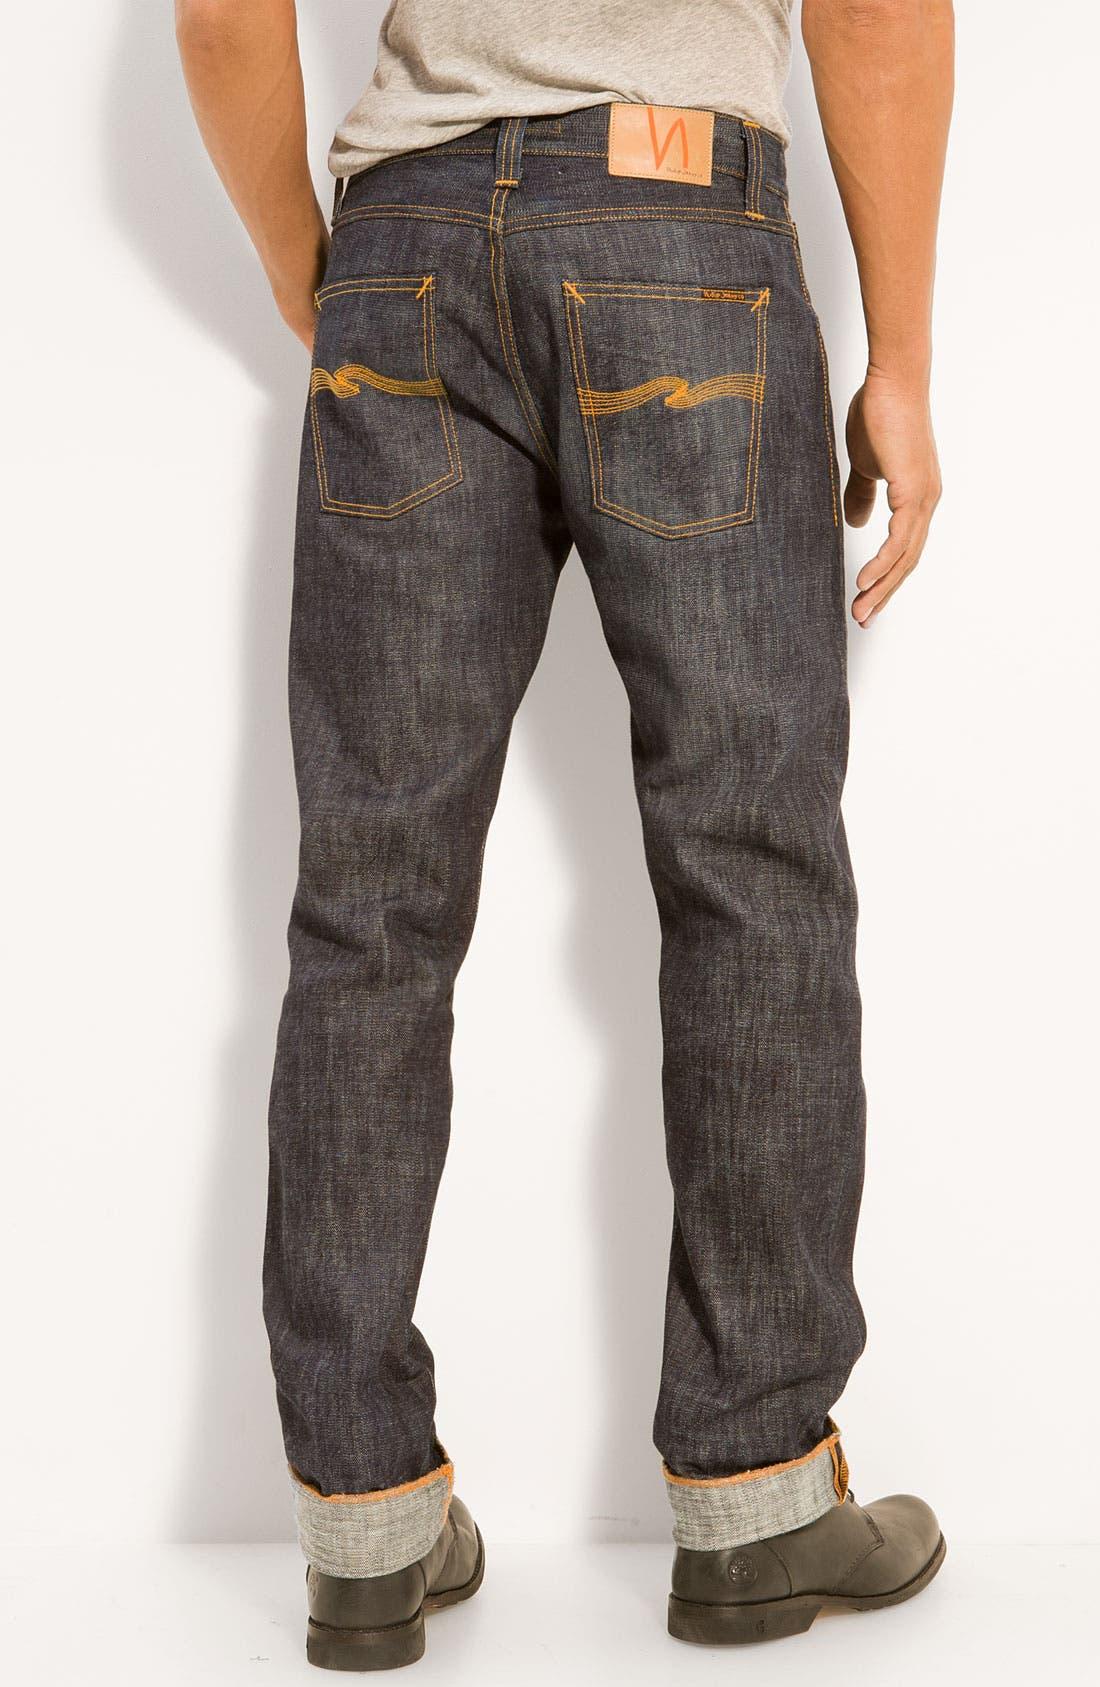 NUDIE JEANS,                             Nudie 'Sharp Bengt' Straight Leg Jeans,                             Main thumbnail 1, color,                             400